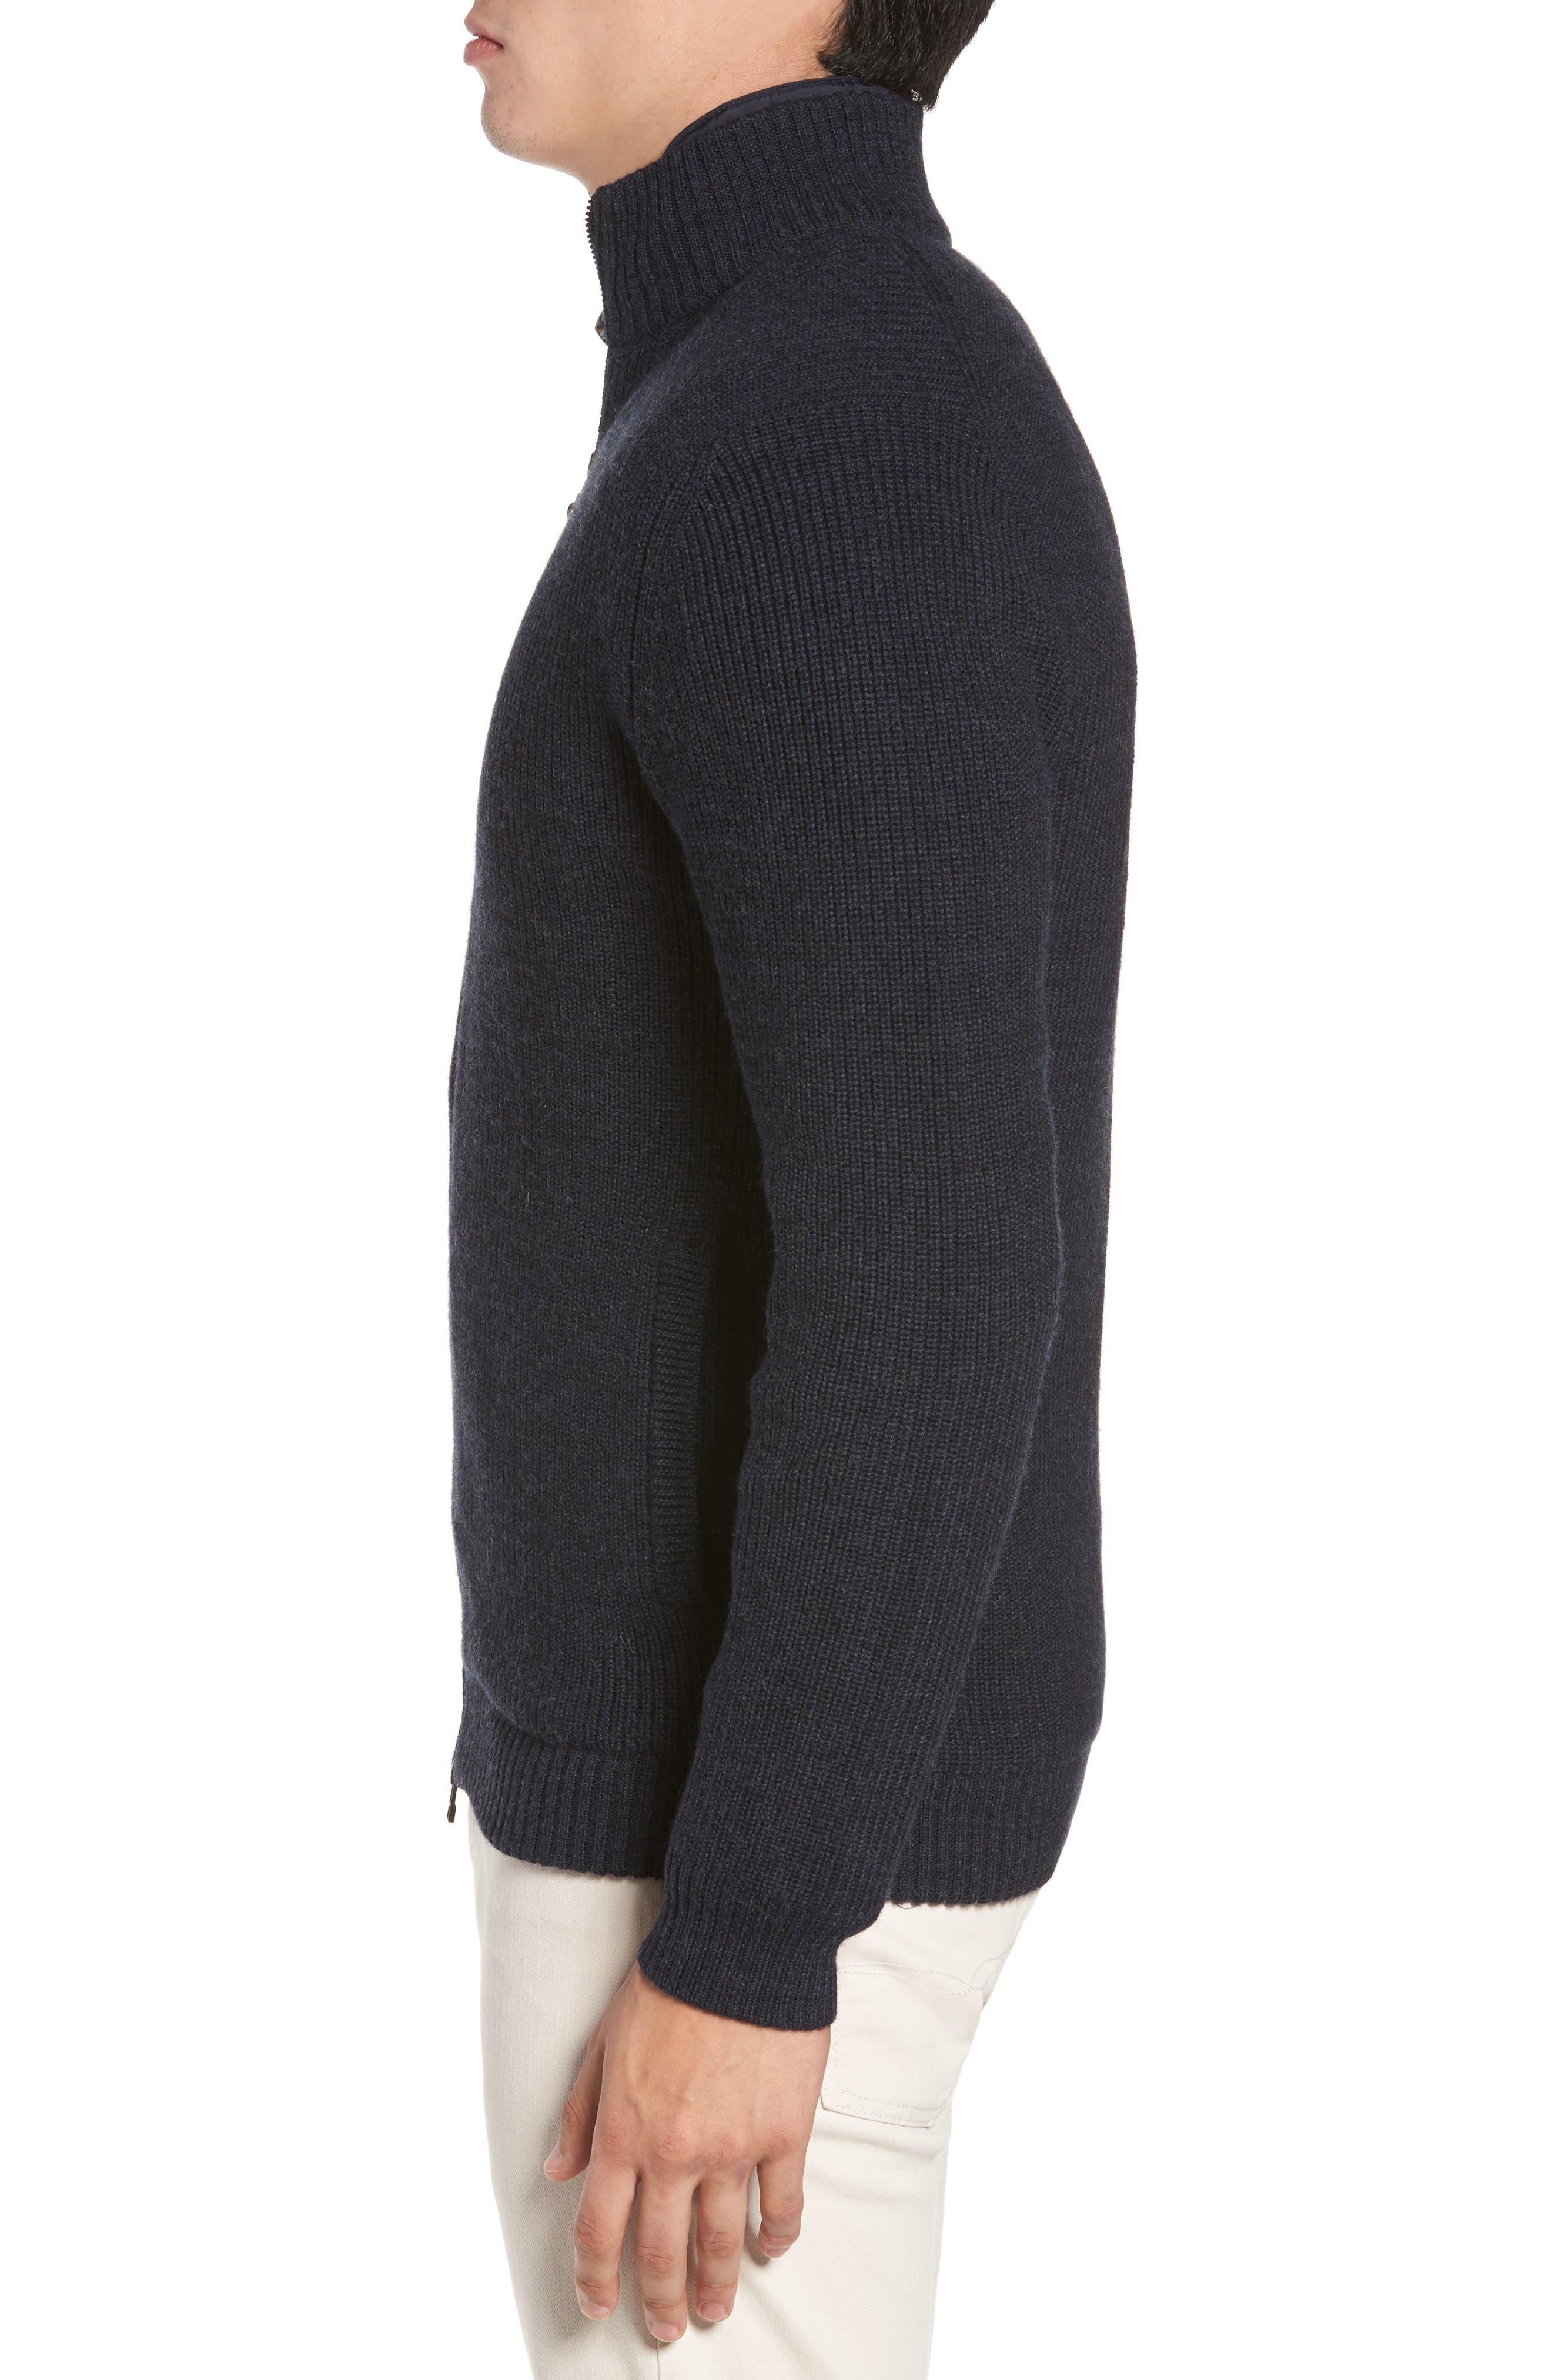 RODD & GUNN, Camerons Track Zip Wool Sweater, Alternate thumbnail 3, color, 412